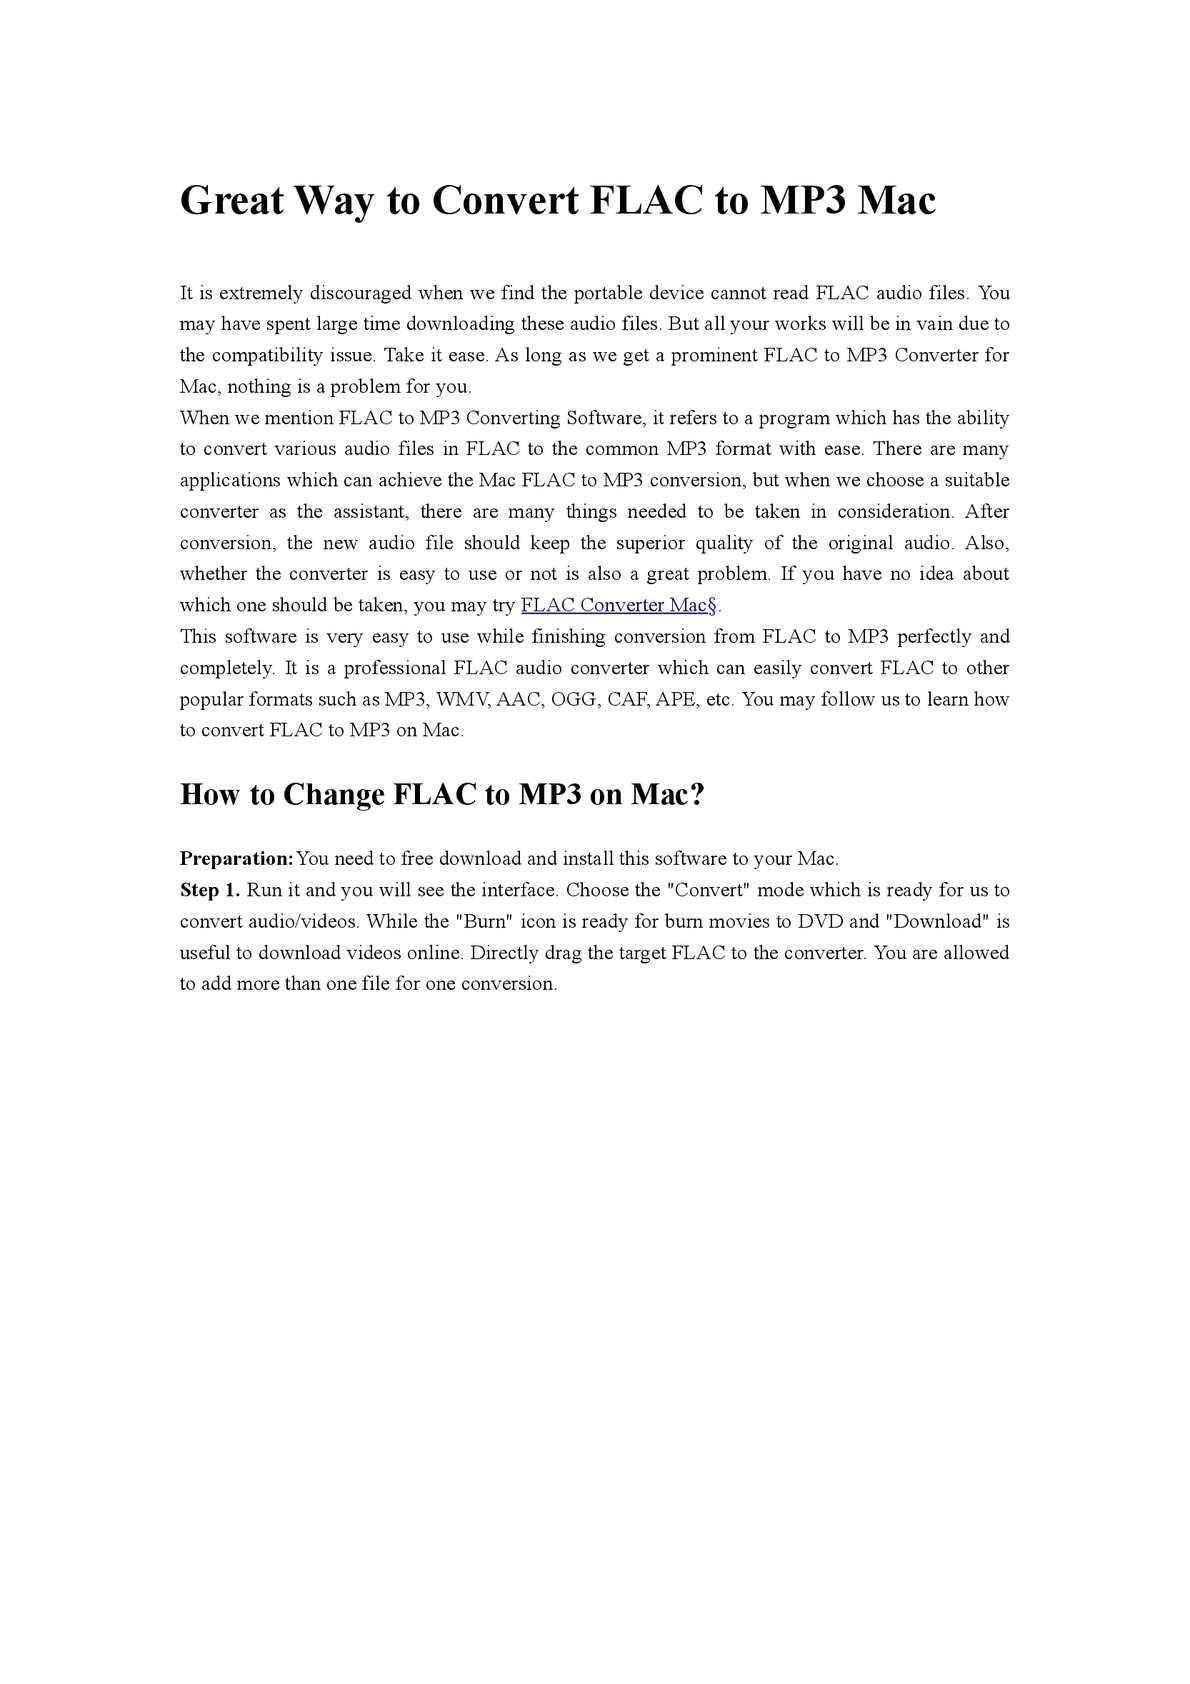 Calaméo - Great Way to Convert FLAC to MP3 Mac